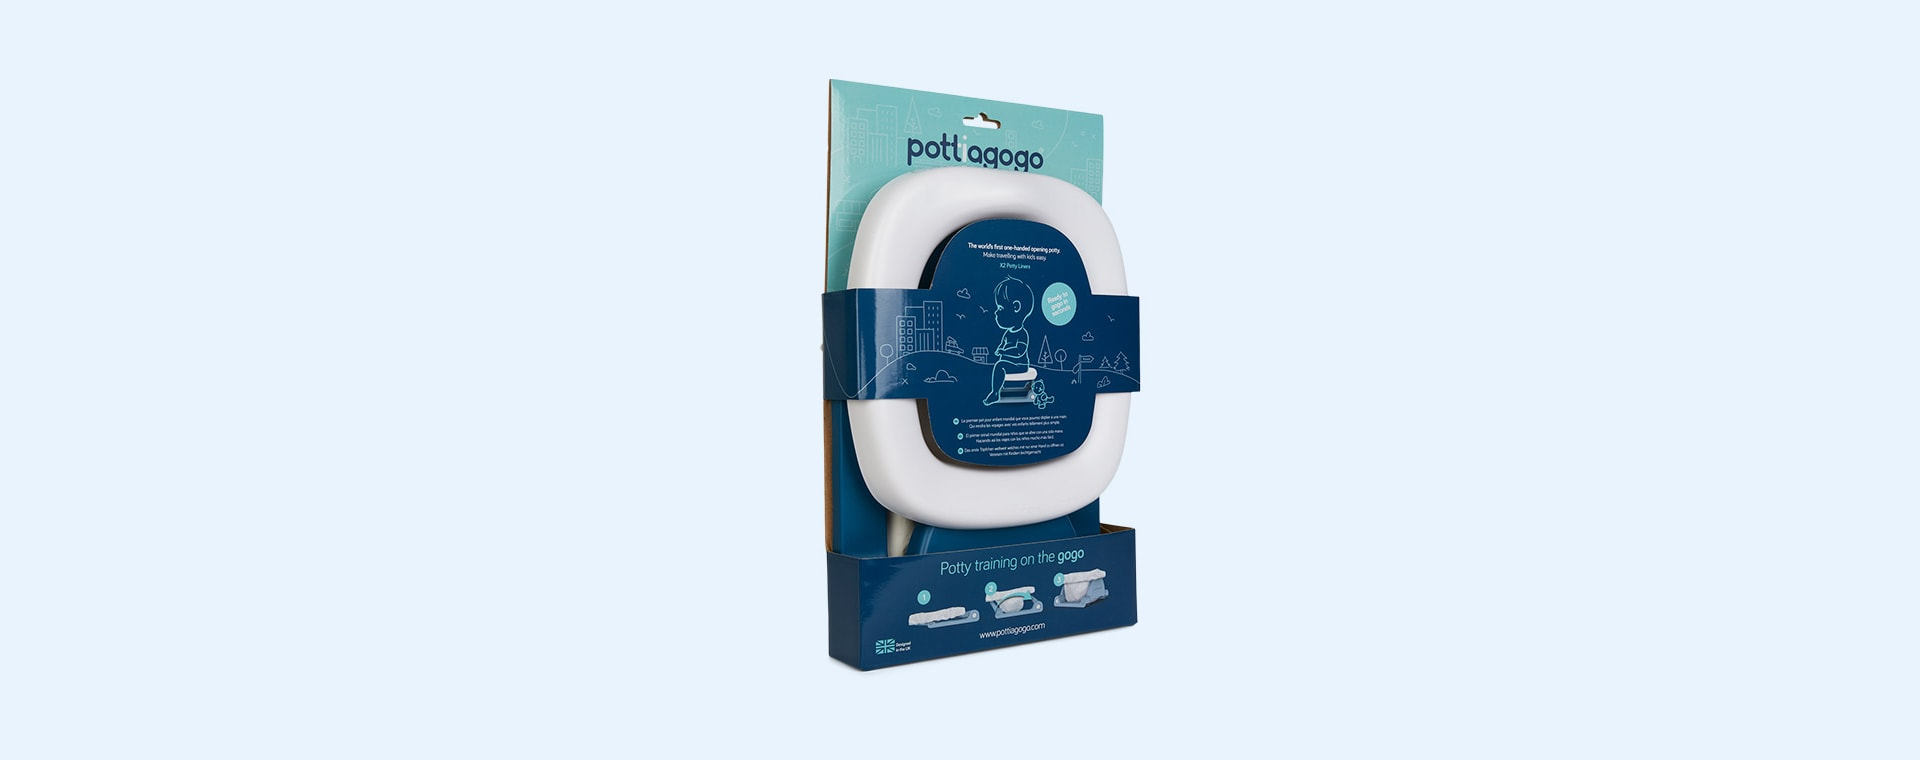 Space Blue Pottiagogo Folding Travel Potty